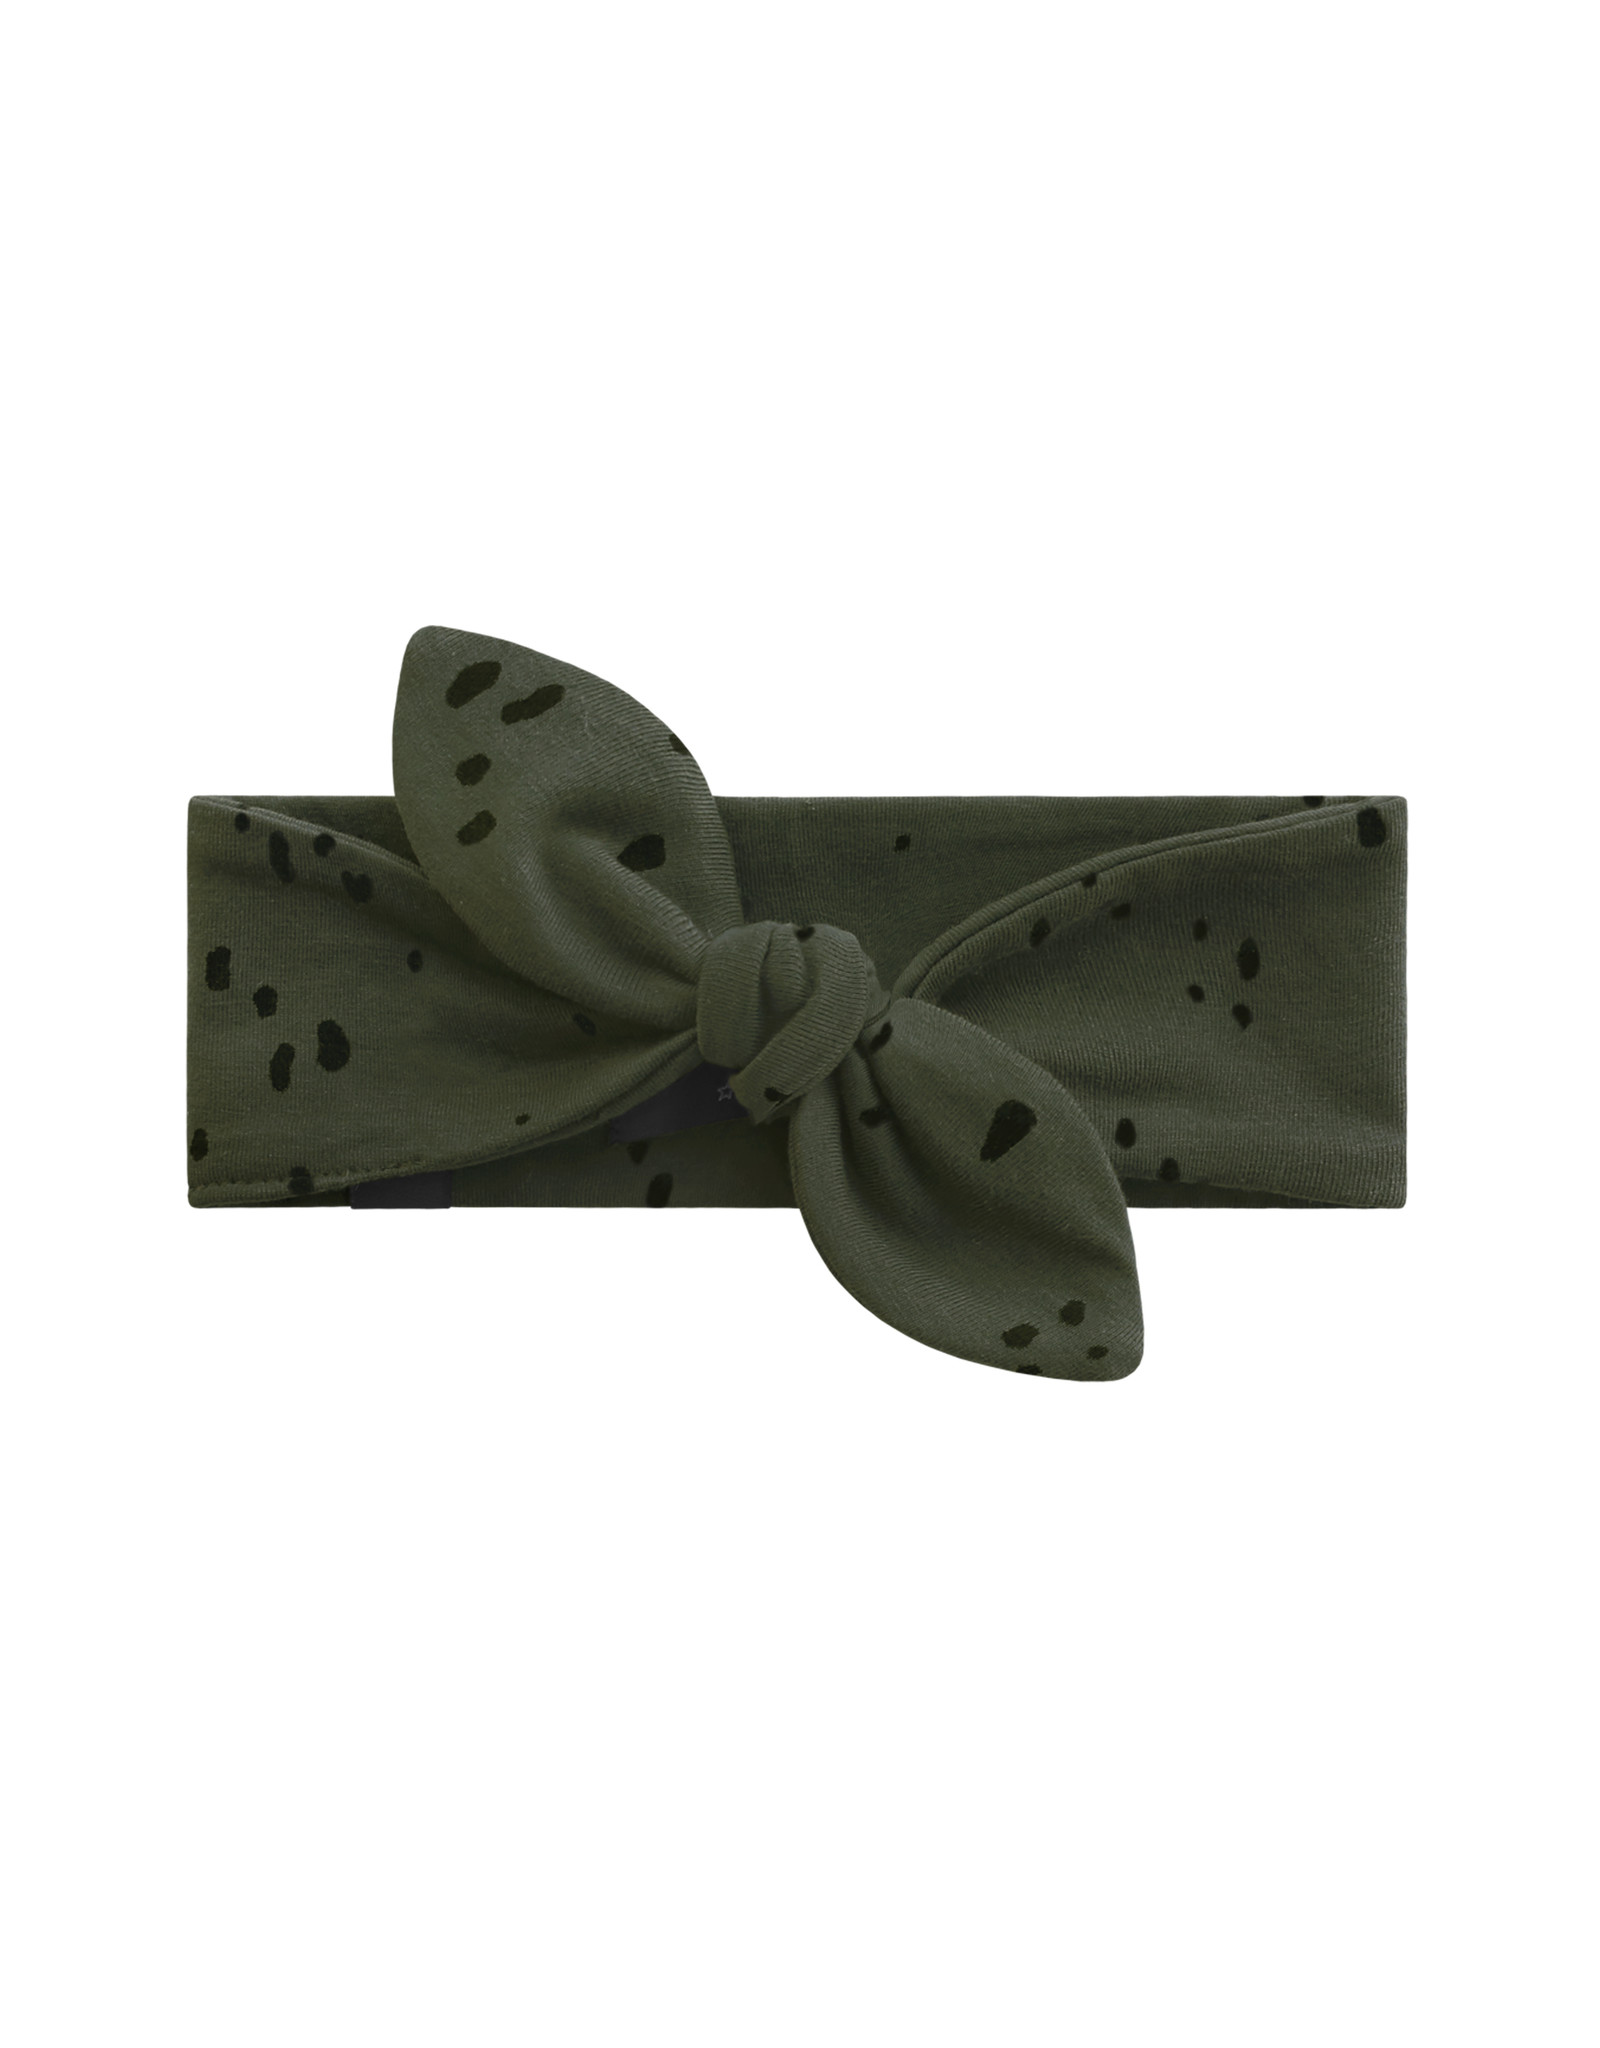 Your Wishes YW | Splatters | Headband | Desk Green